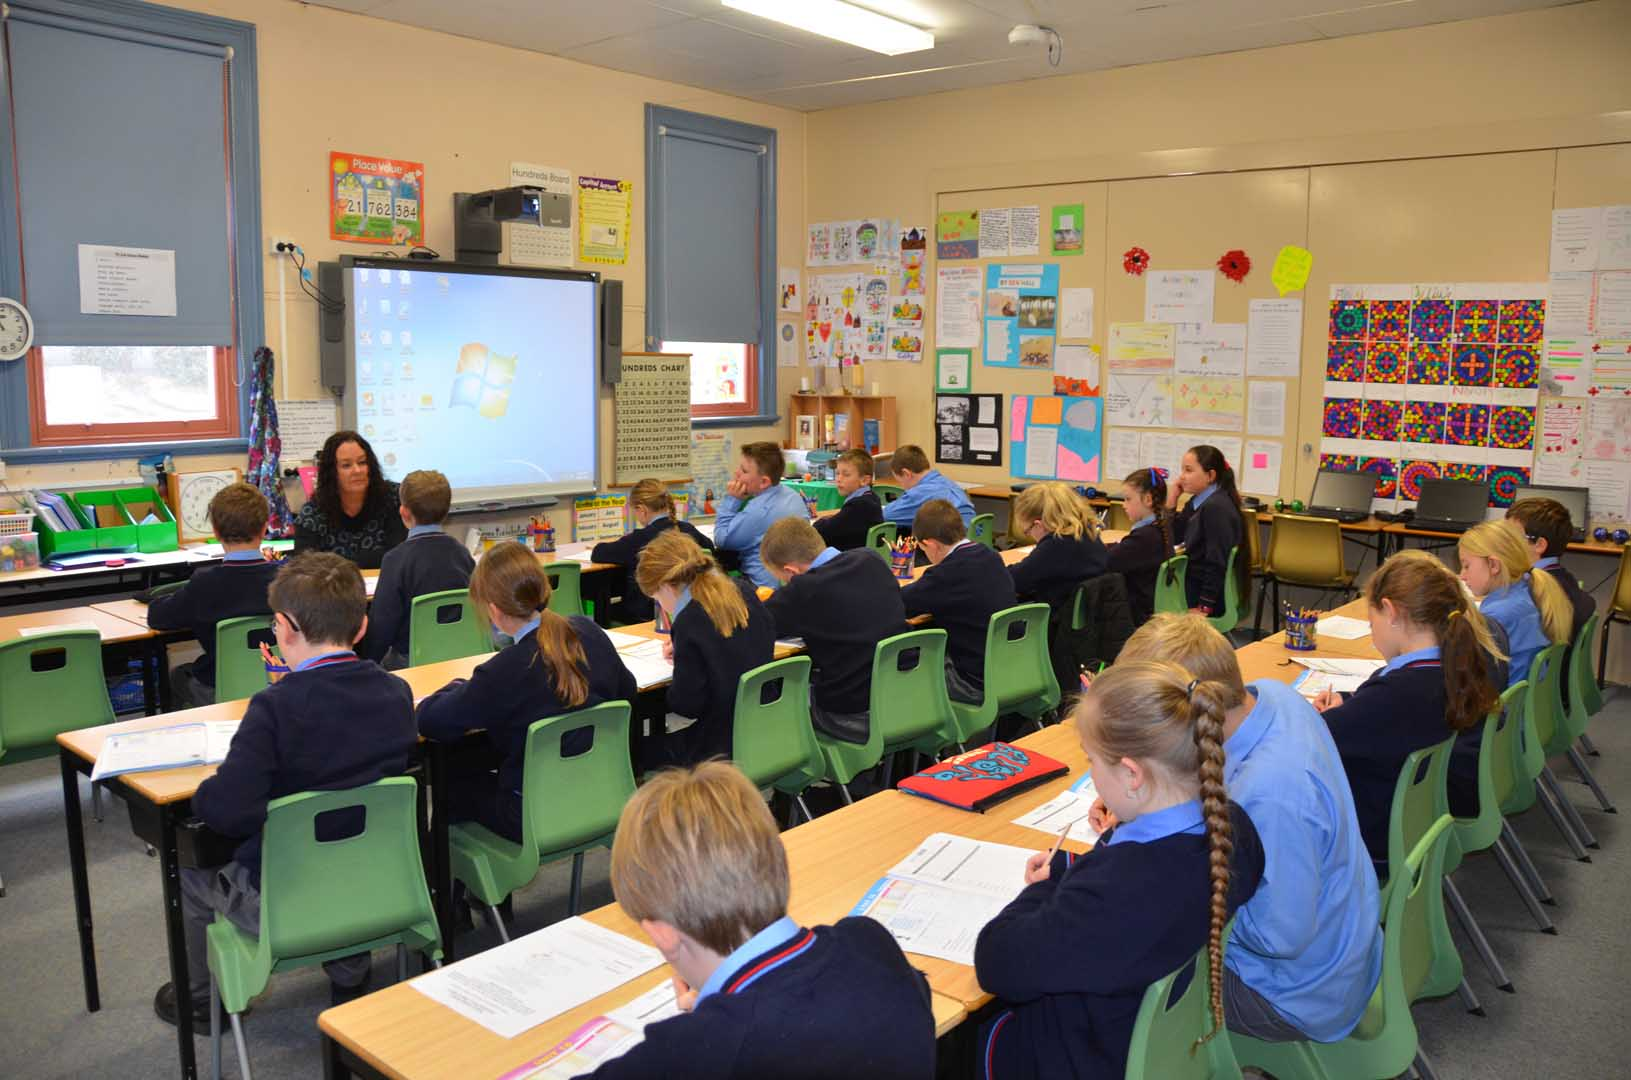 St-Patricks-walcha-classroom